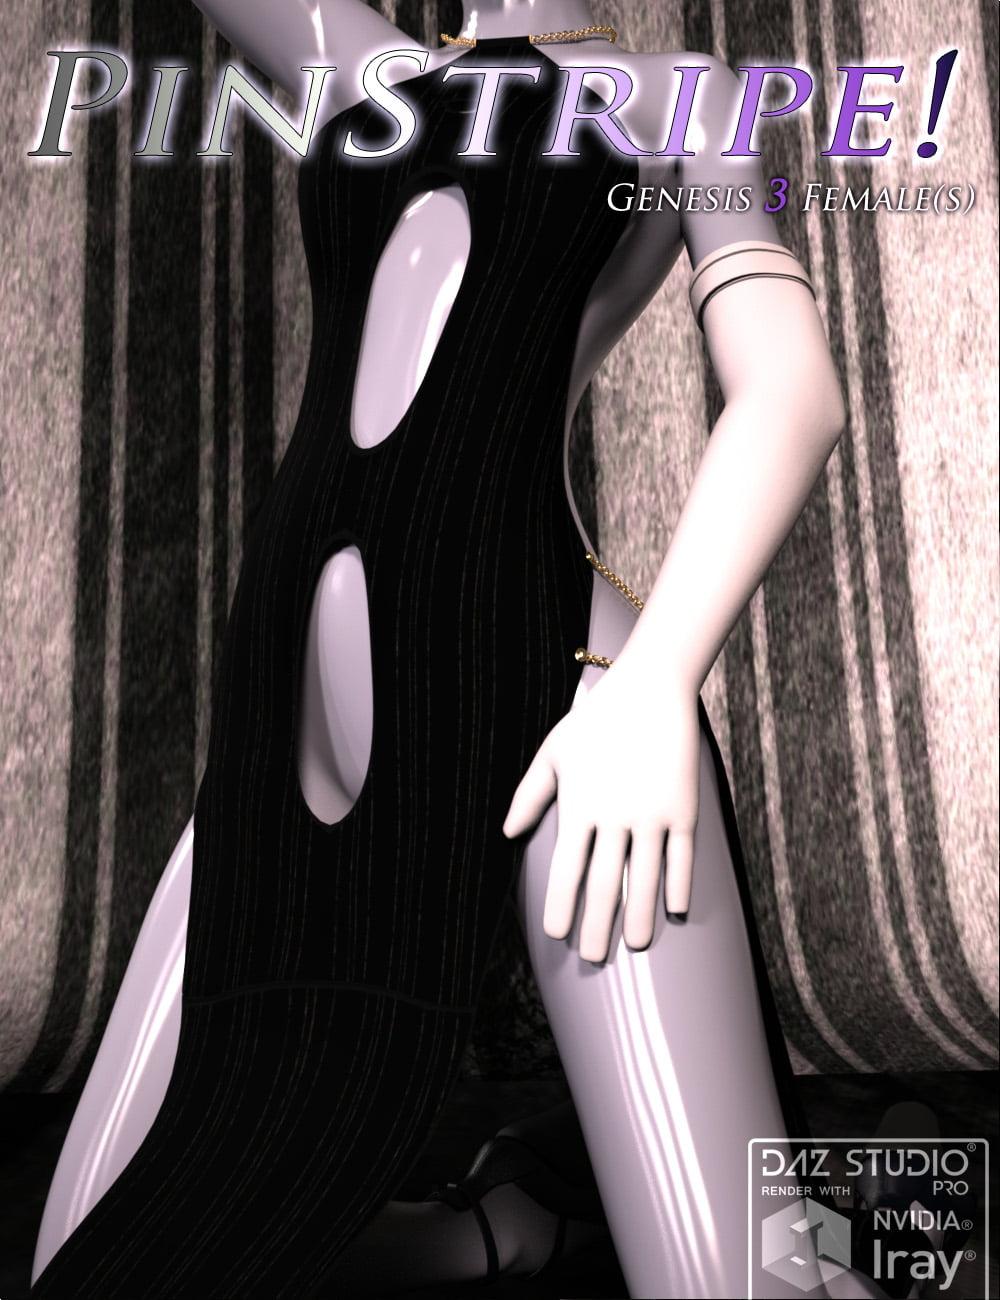 Pinstripe! for Genese 3 Females - clothing, daz-poser-carrara